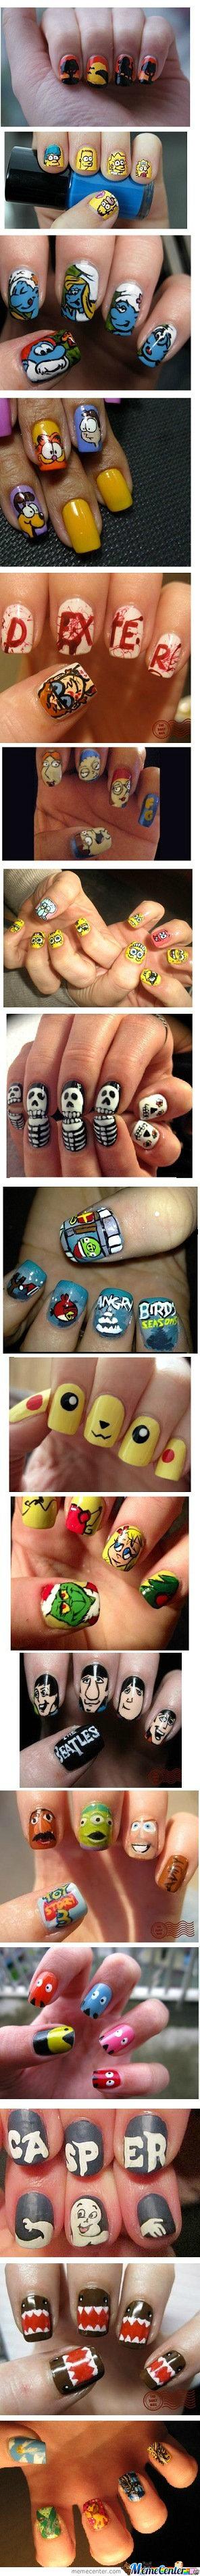 The Simpsons, Garfield, Dexter, The Smurfs, Sponge Bob, Angry Birds ...